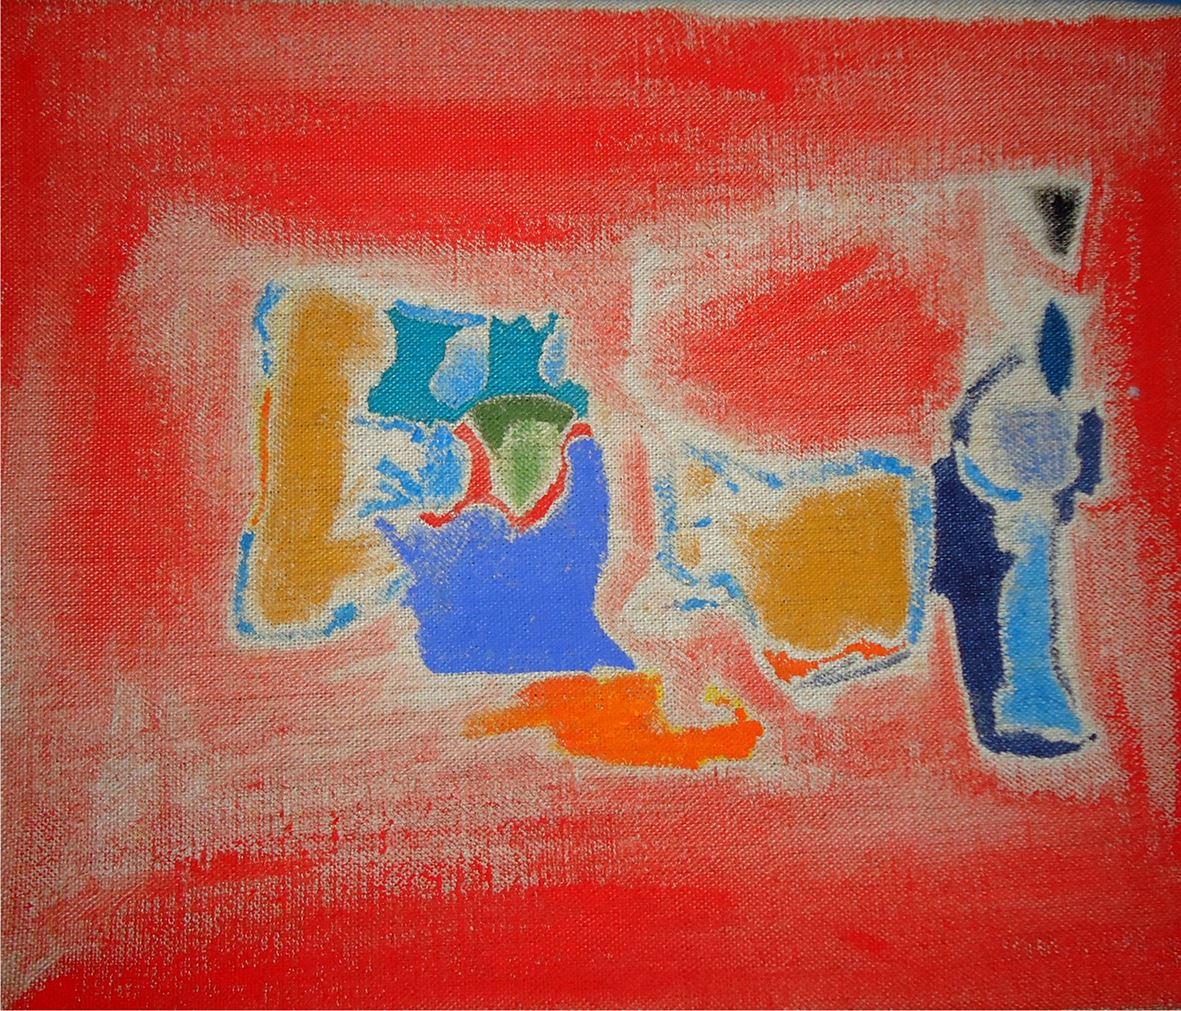 © Copy: Jamtli, Artist in Residence - Catherine Froy